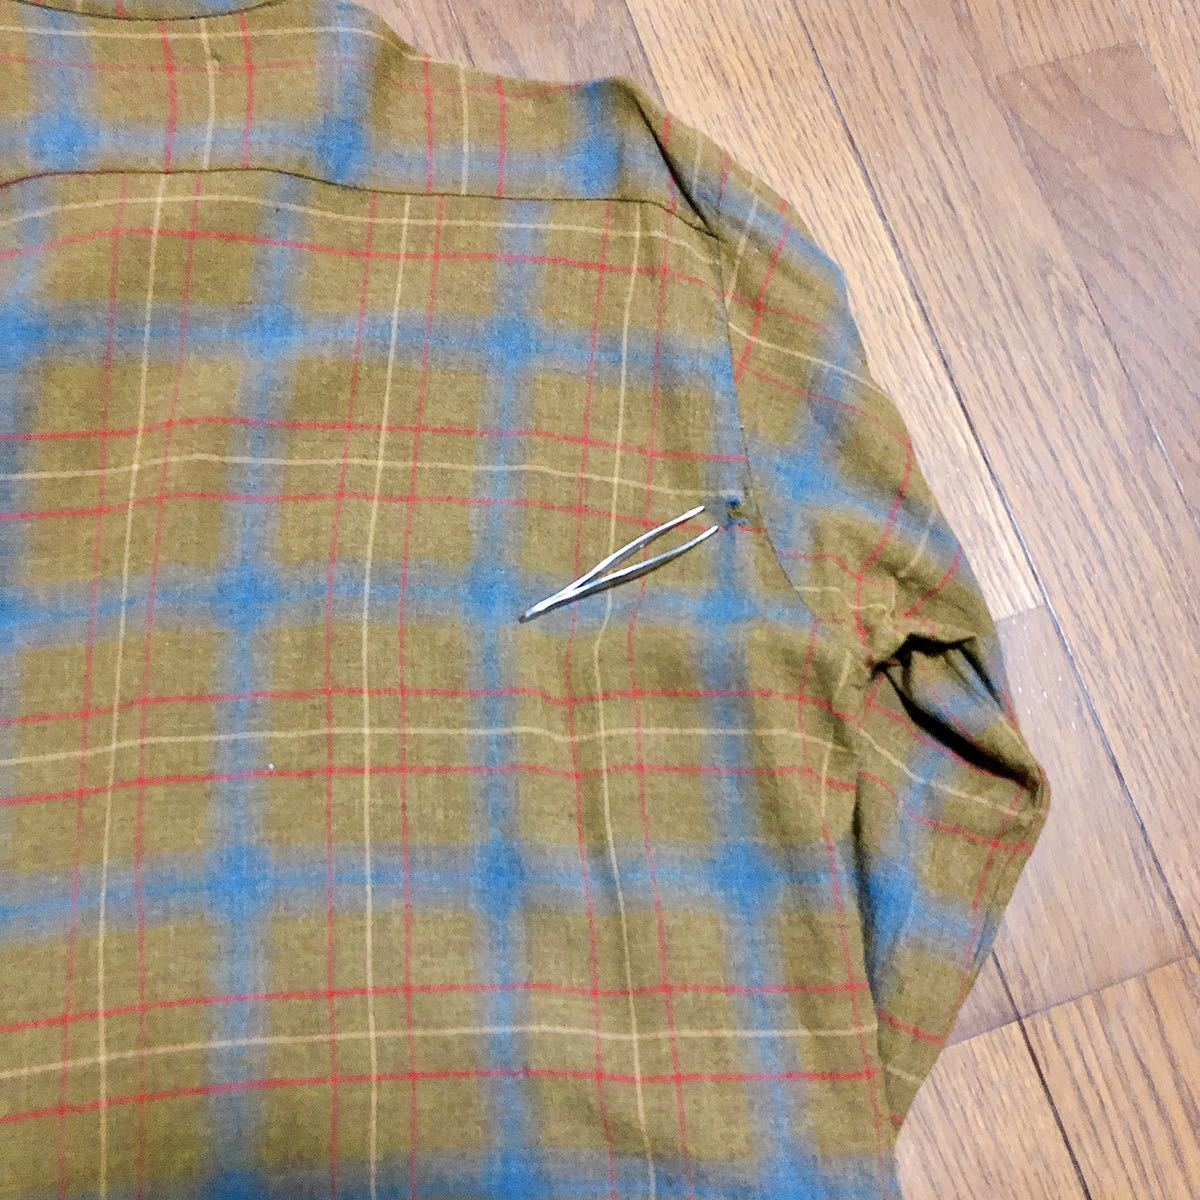 Vintage レーヨン チェックシャツ XL 長袖シャツ チェックシャツ ビンテージ タウンクラフト_画像5